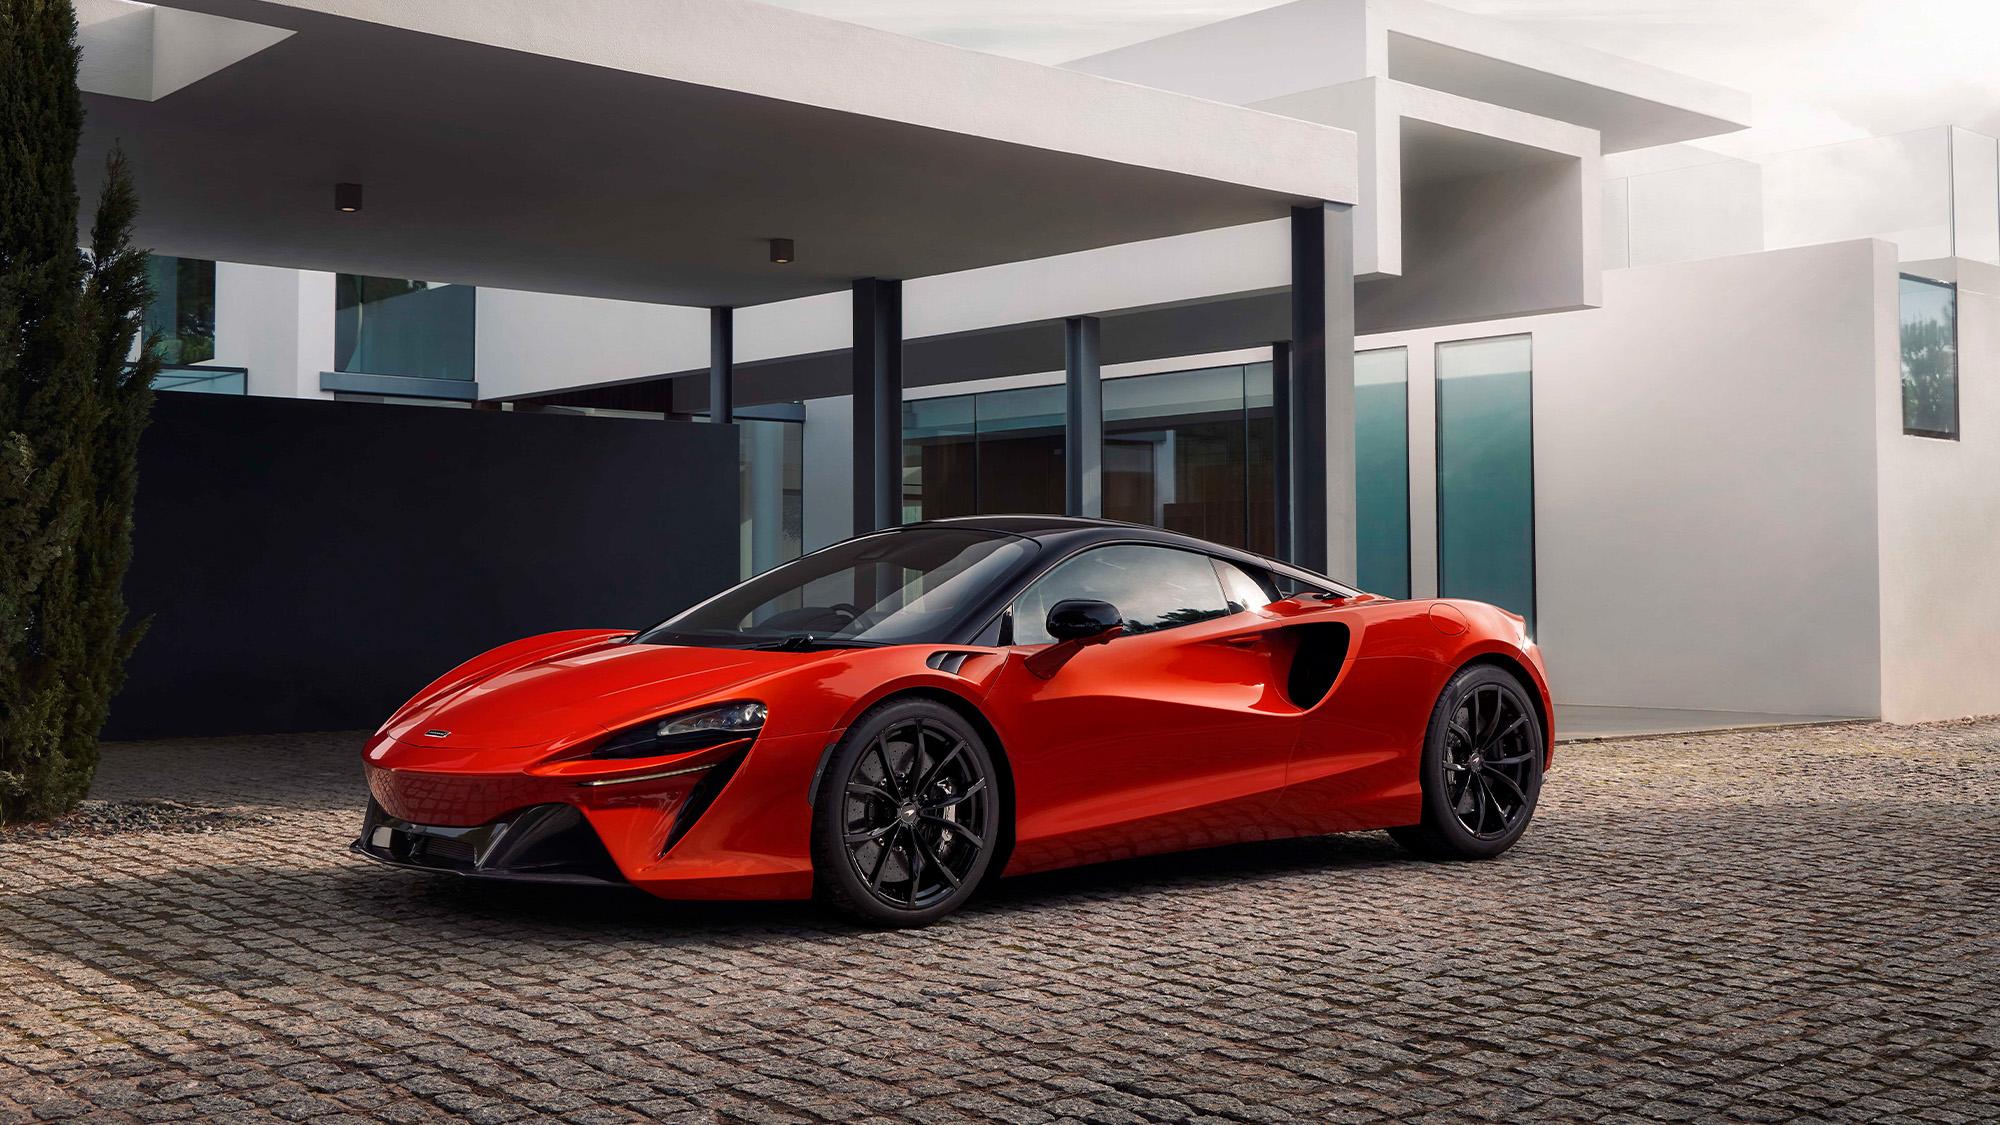 2021 McLaren Artura parked